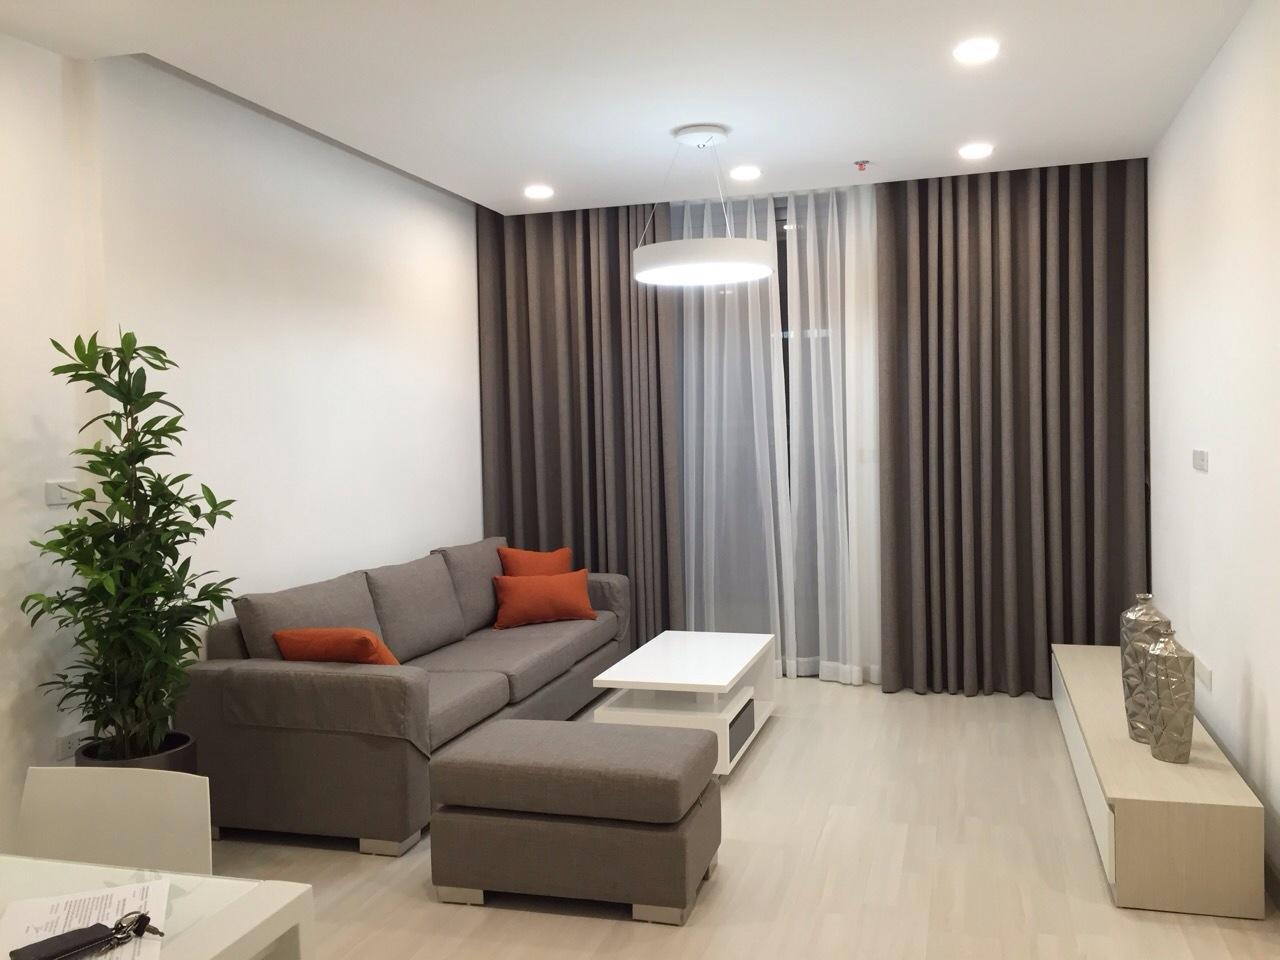 Vinhomes Nguyen Chi Thanh アパートにおける2BRお部屋